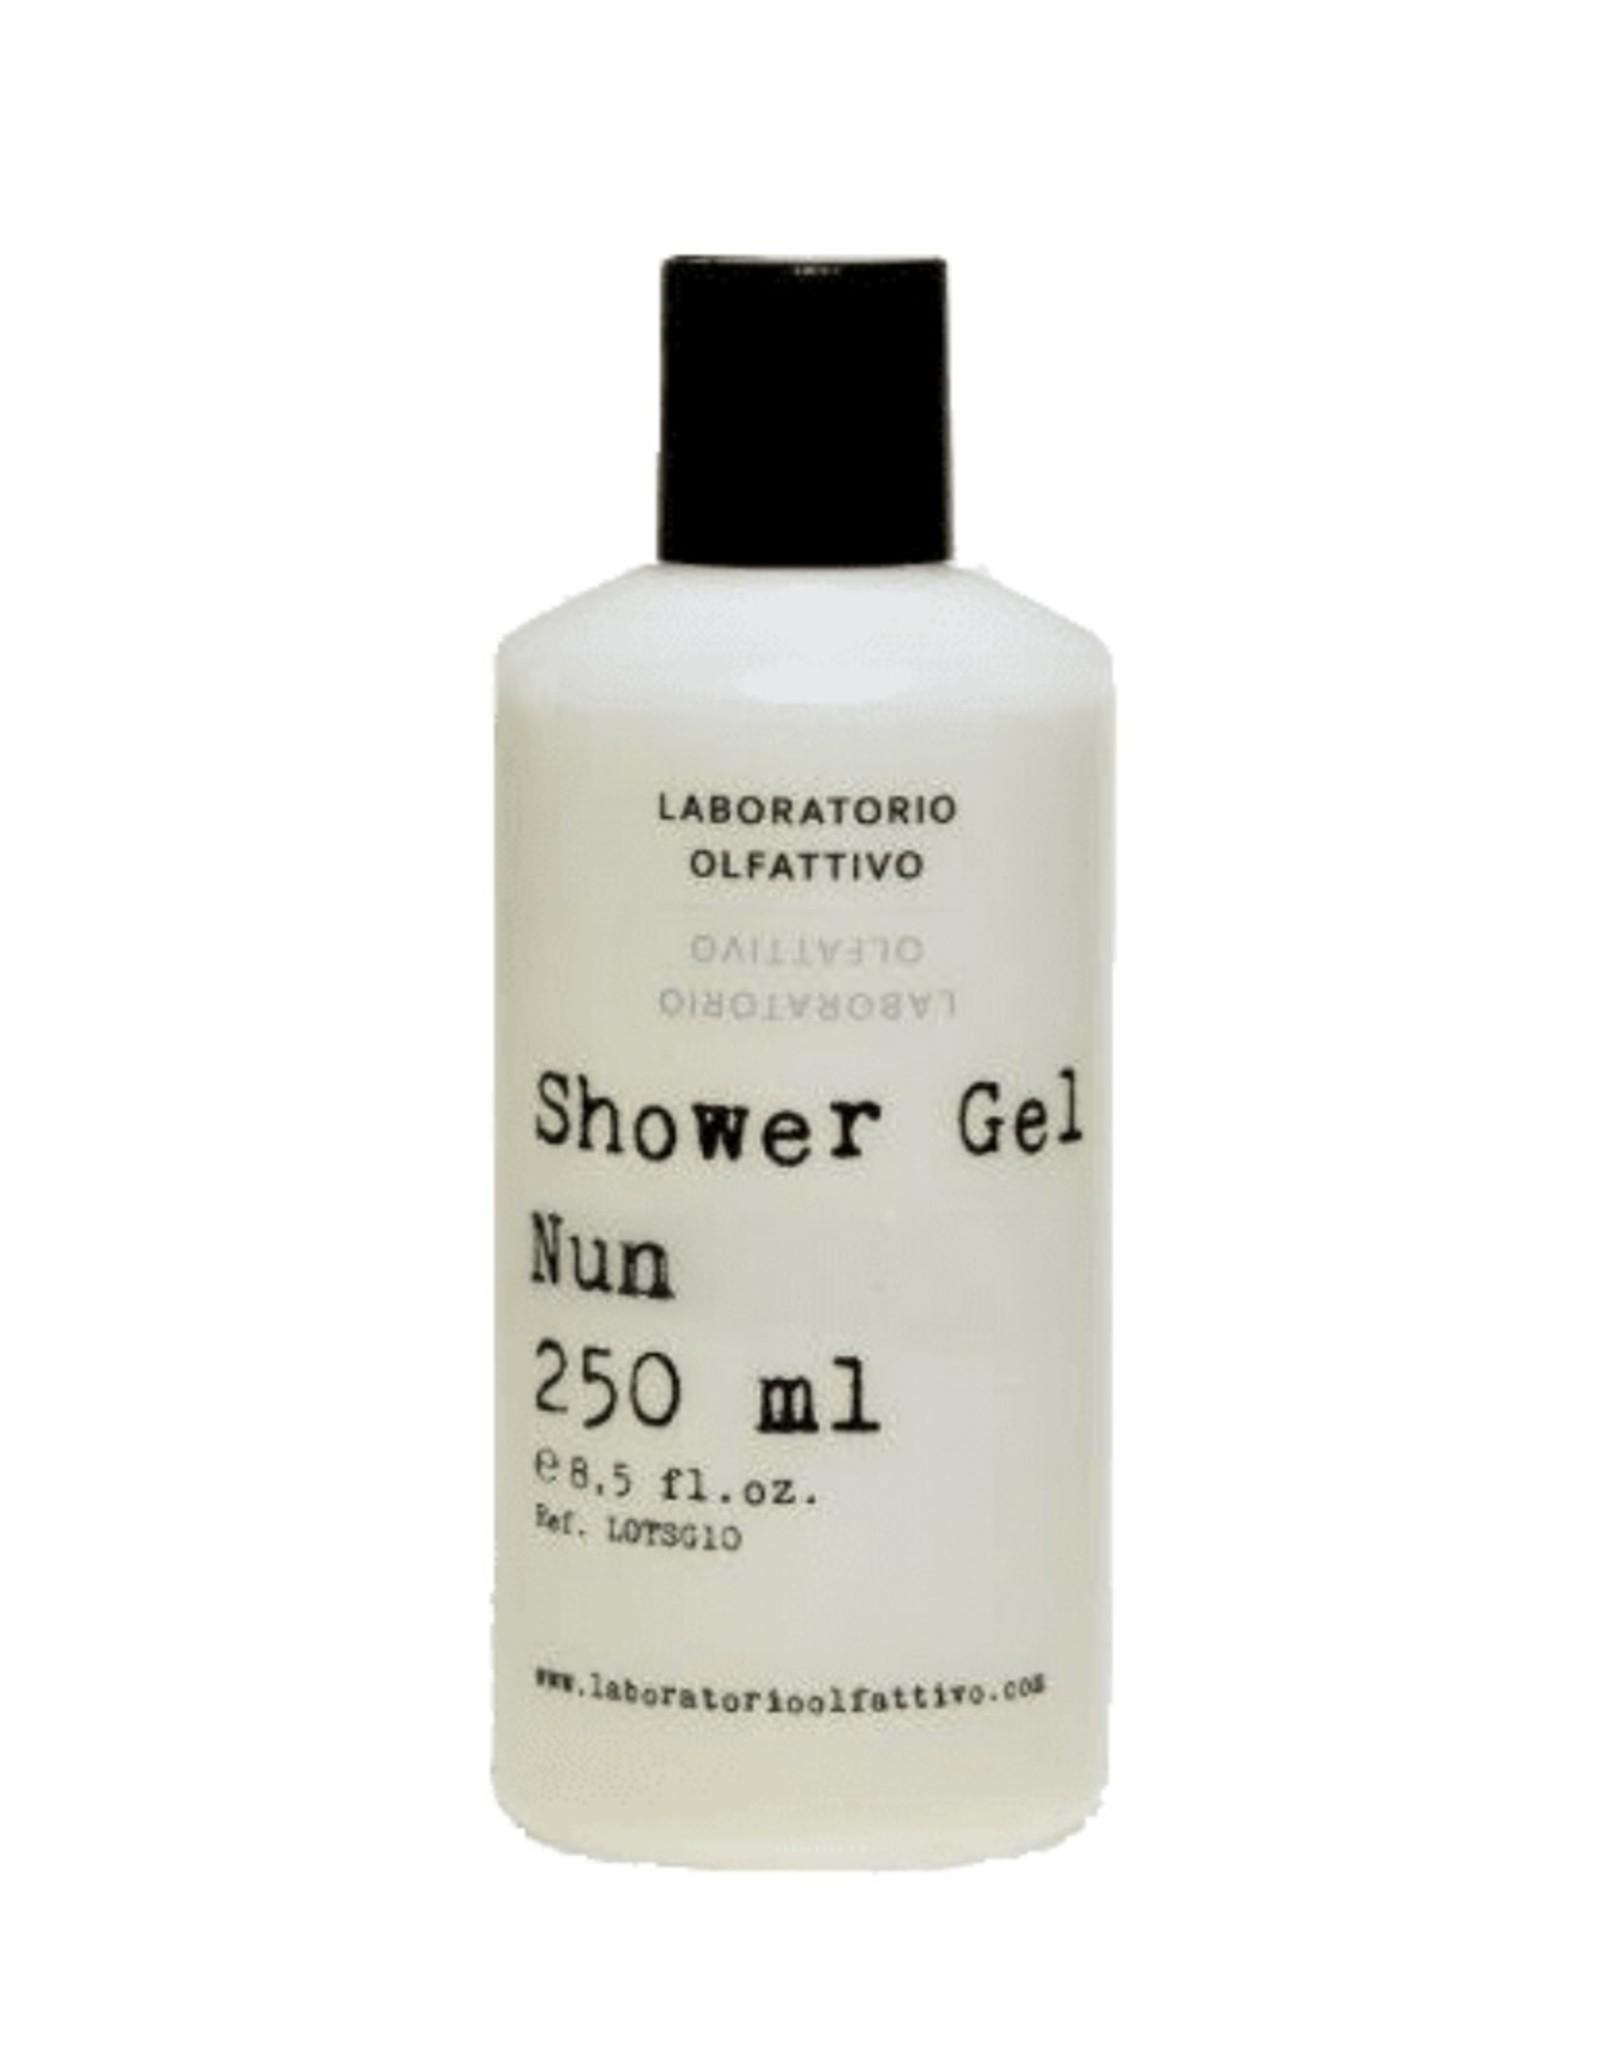 Laboratorio Olfattivo Shower Gel Nun, 250ml